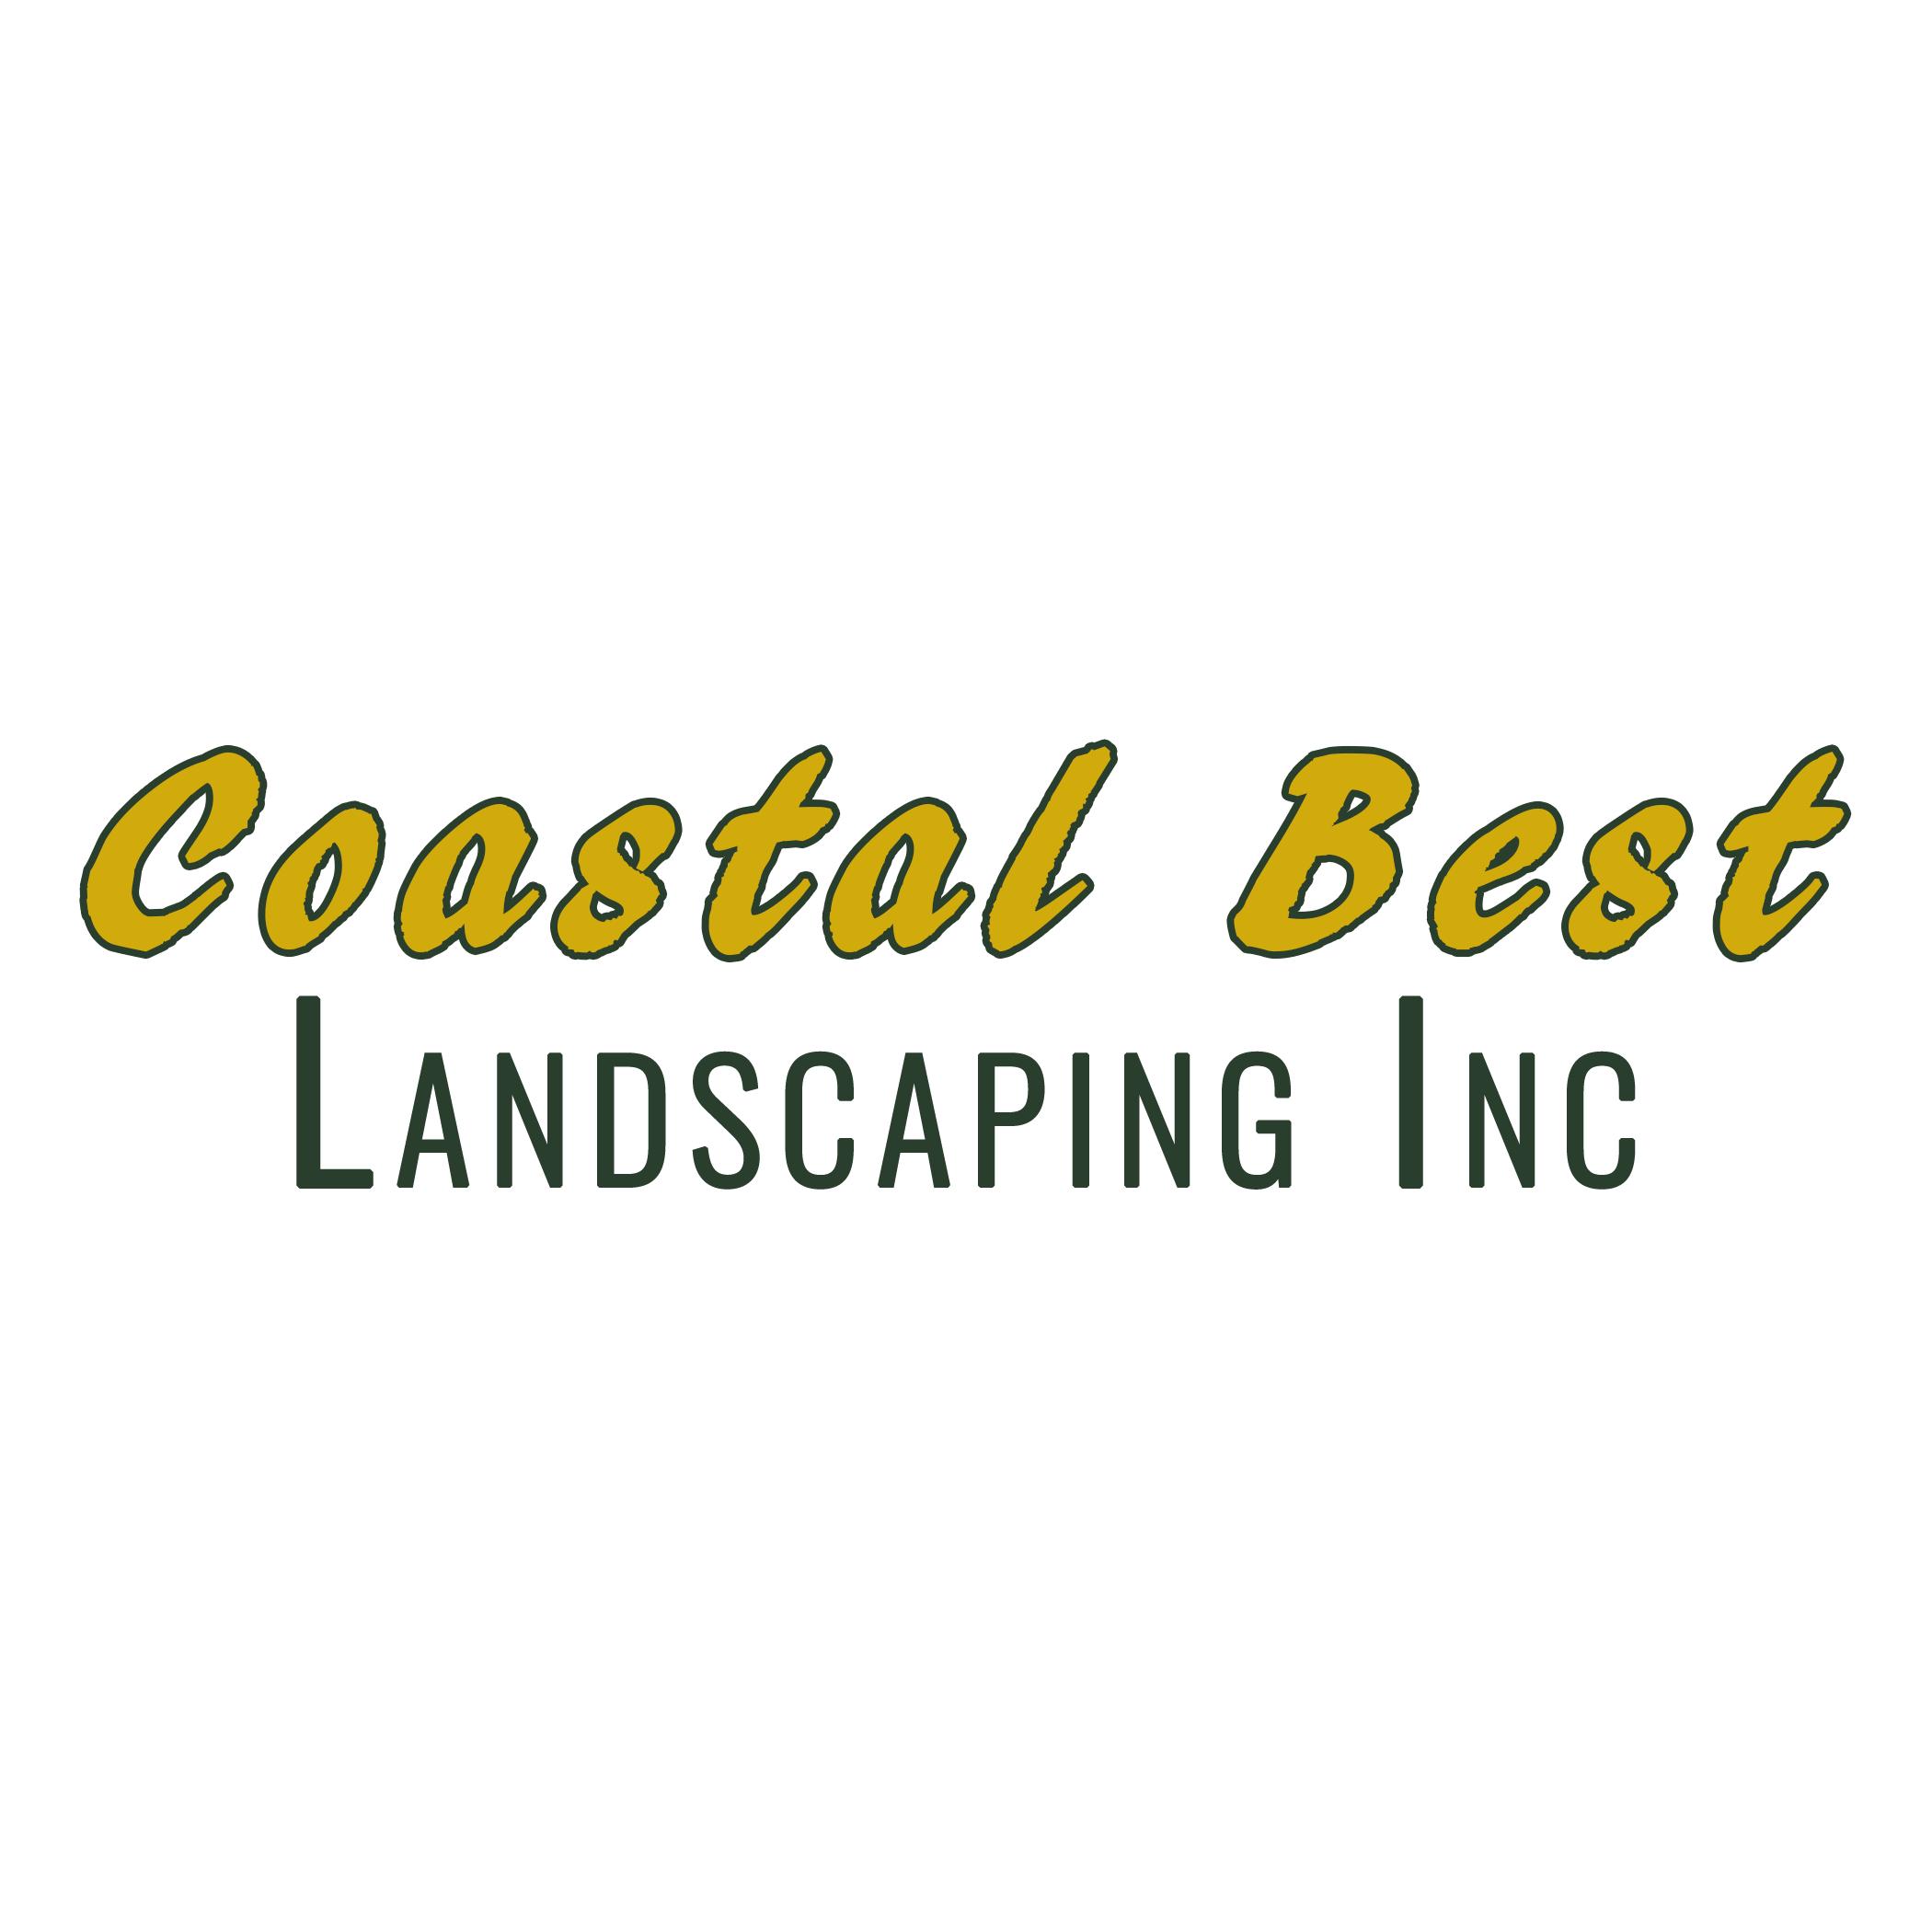 Coastal Best Landscaping Inc.